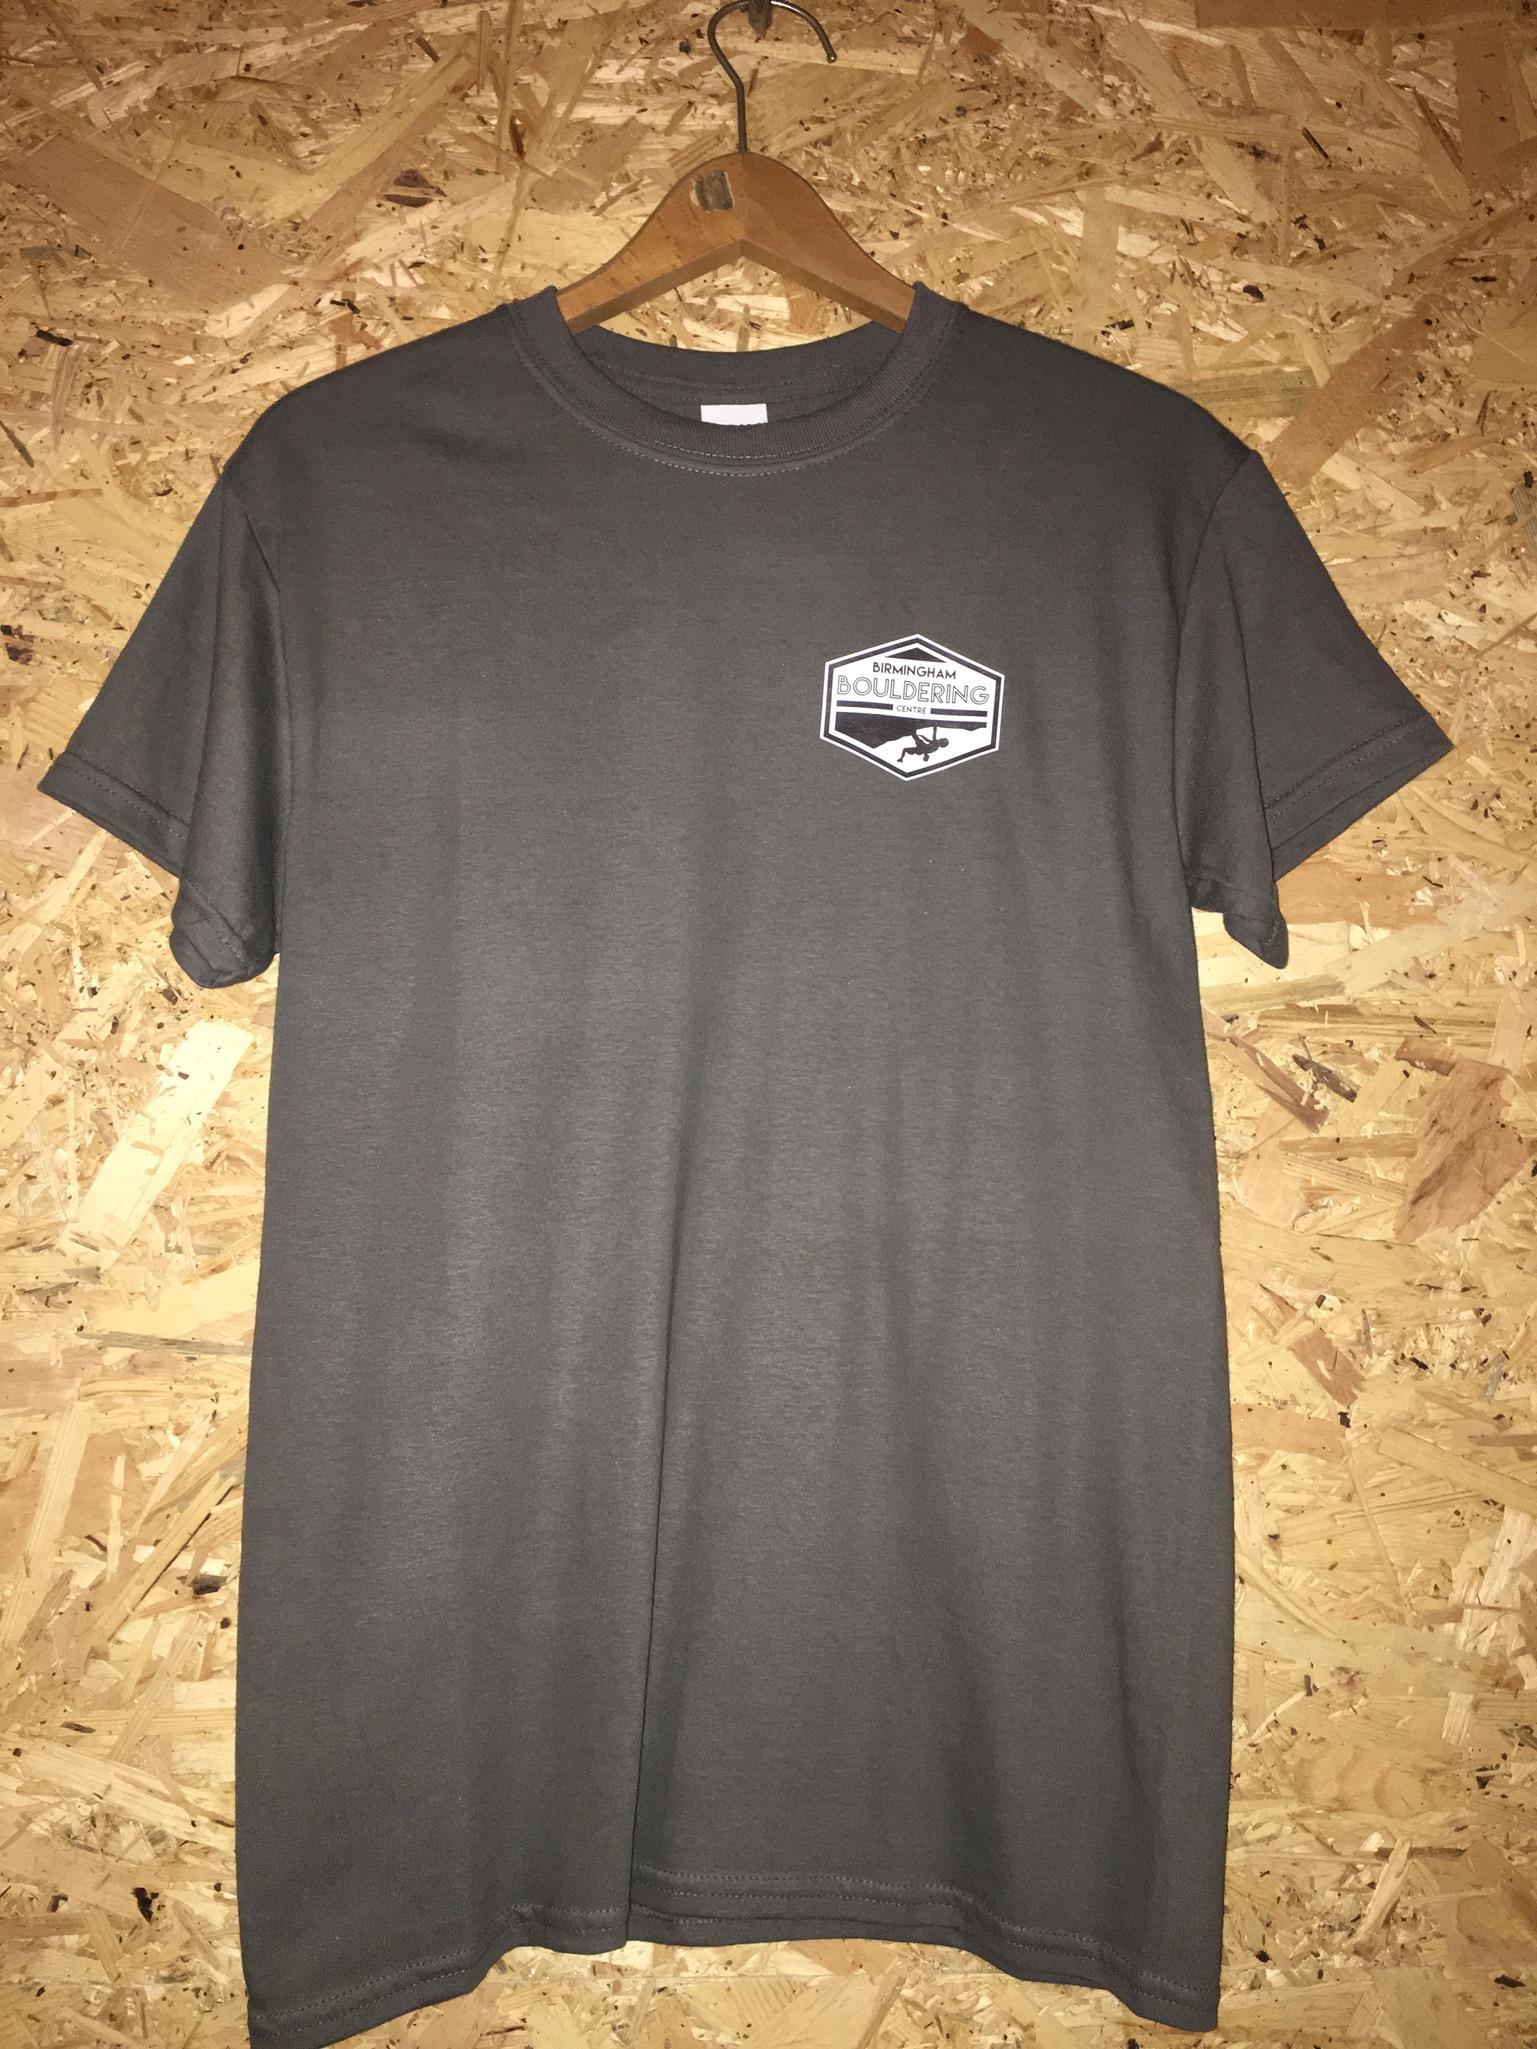 BBC T-Shirt £15